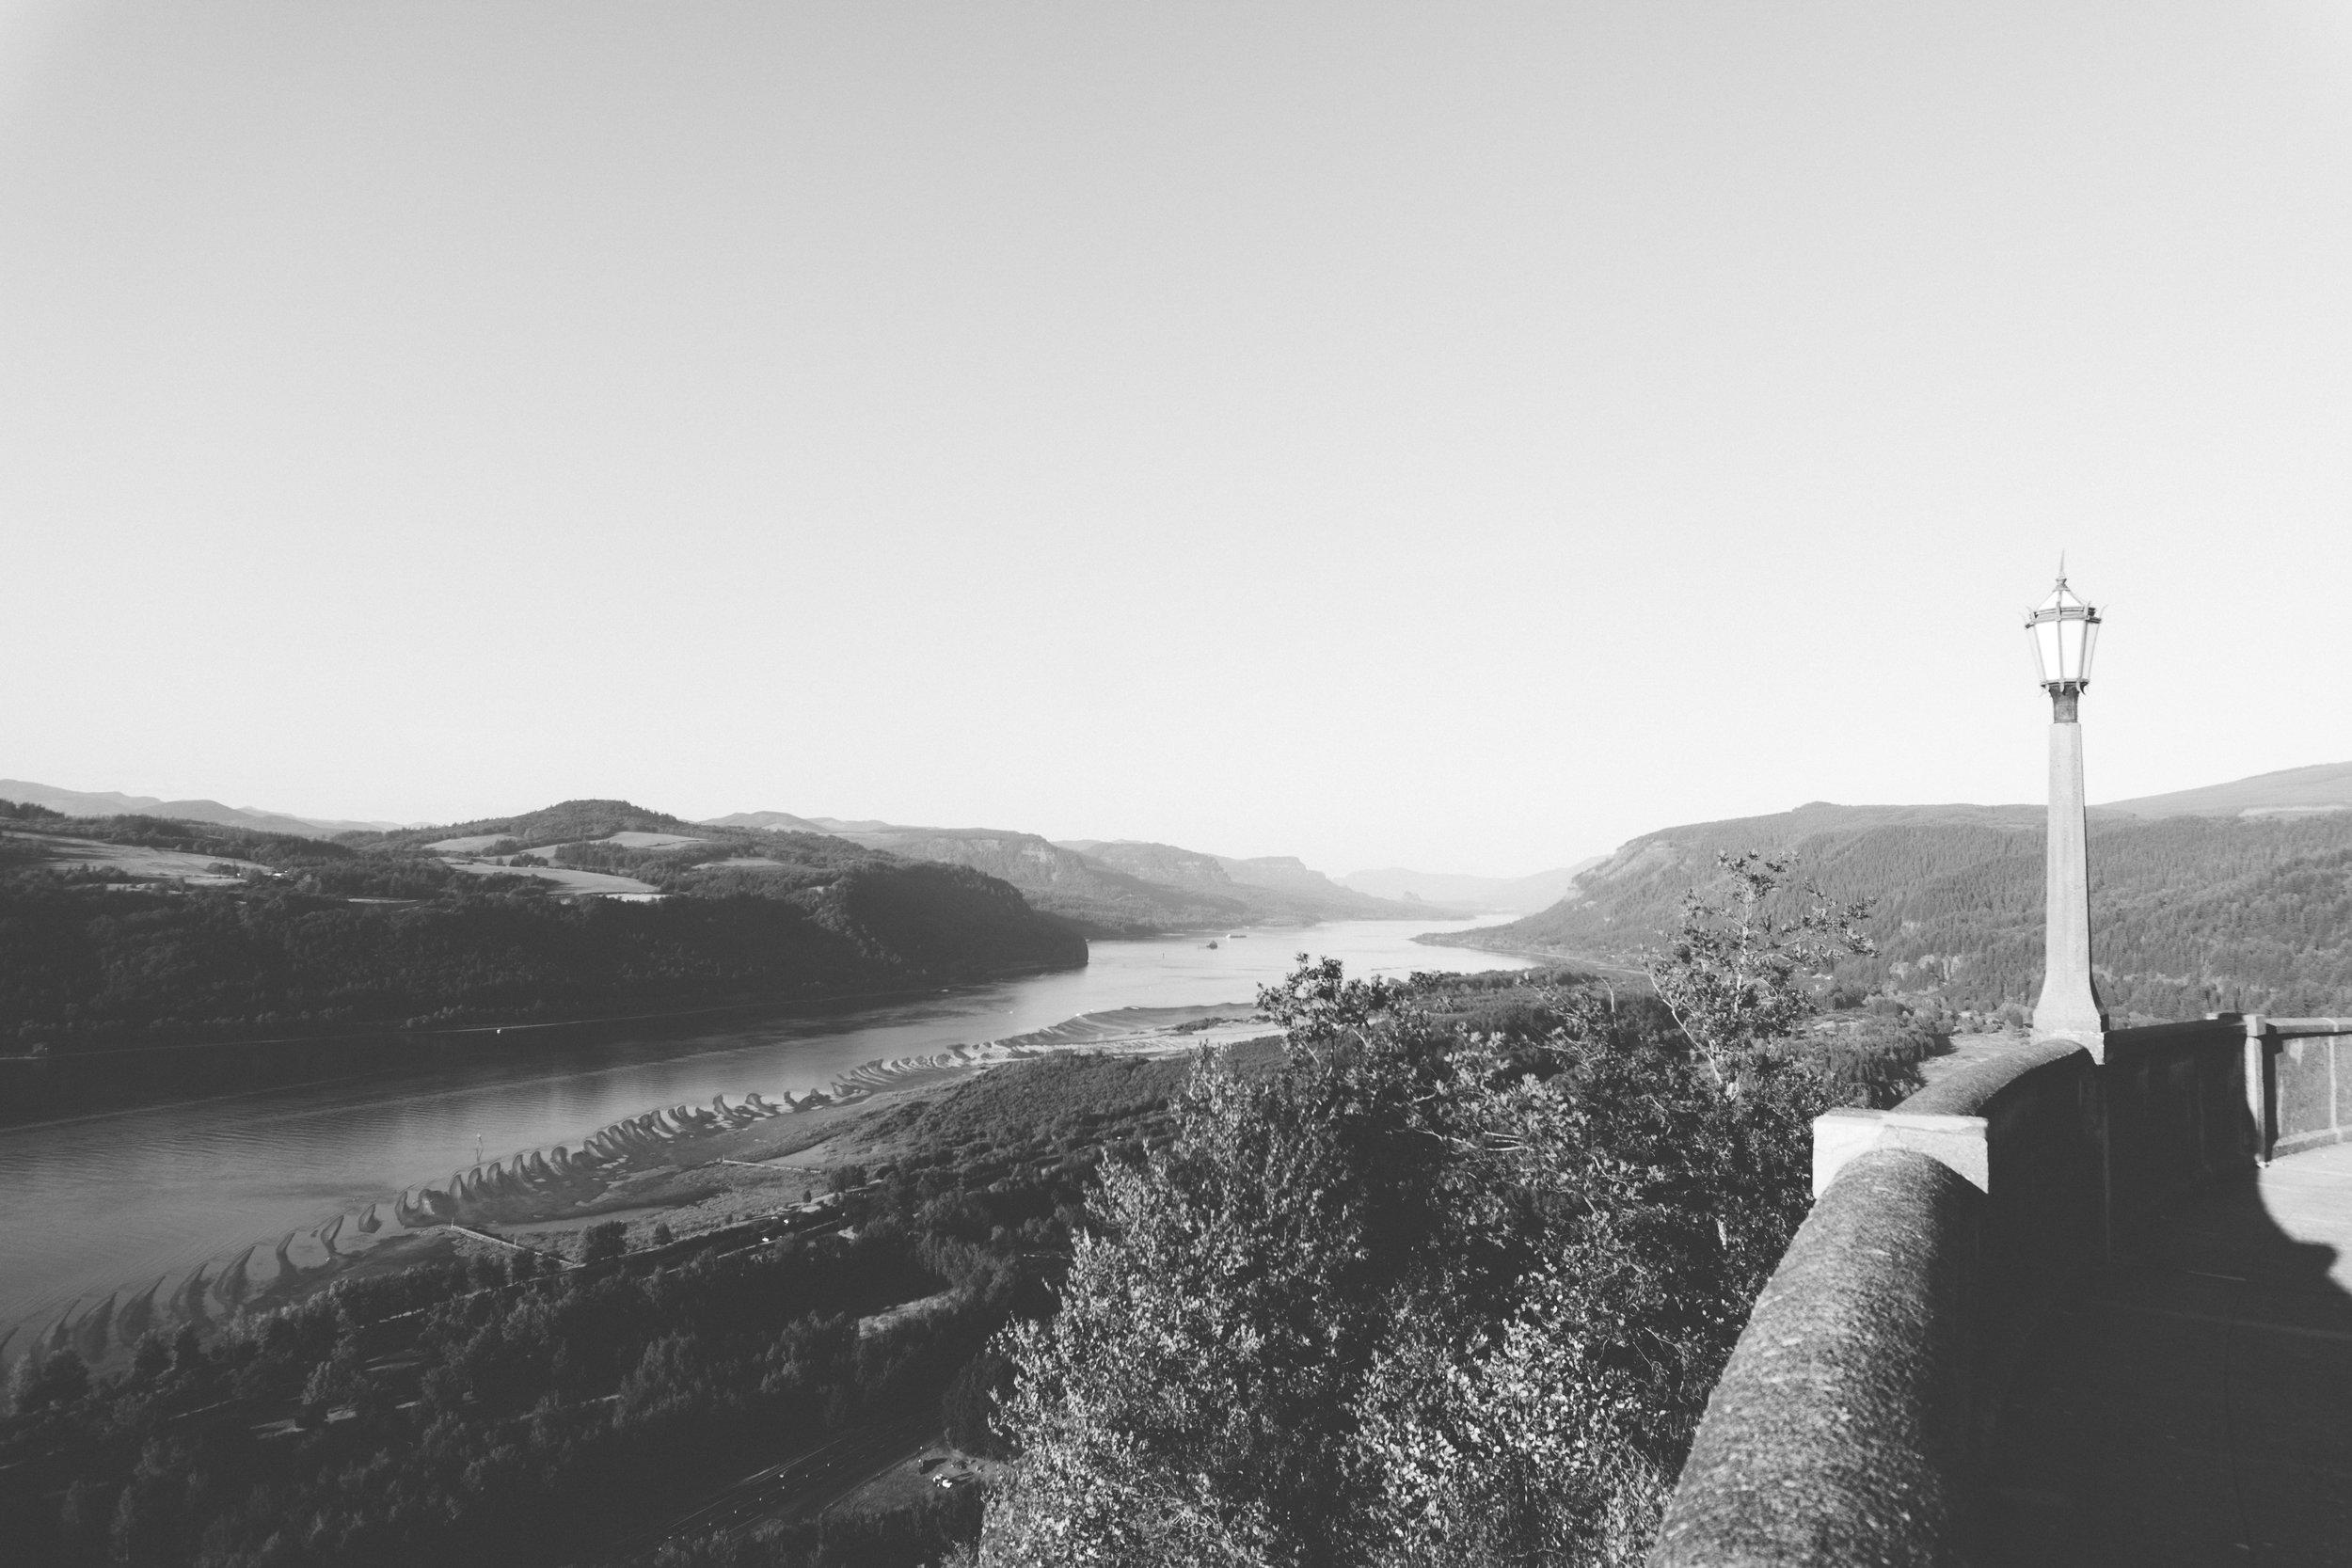 columbia river gorge - b+w